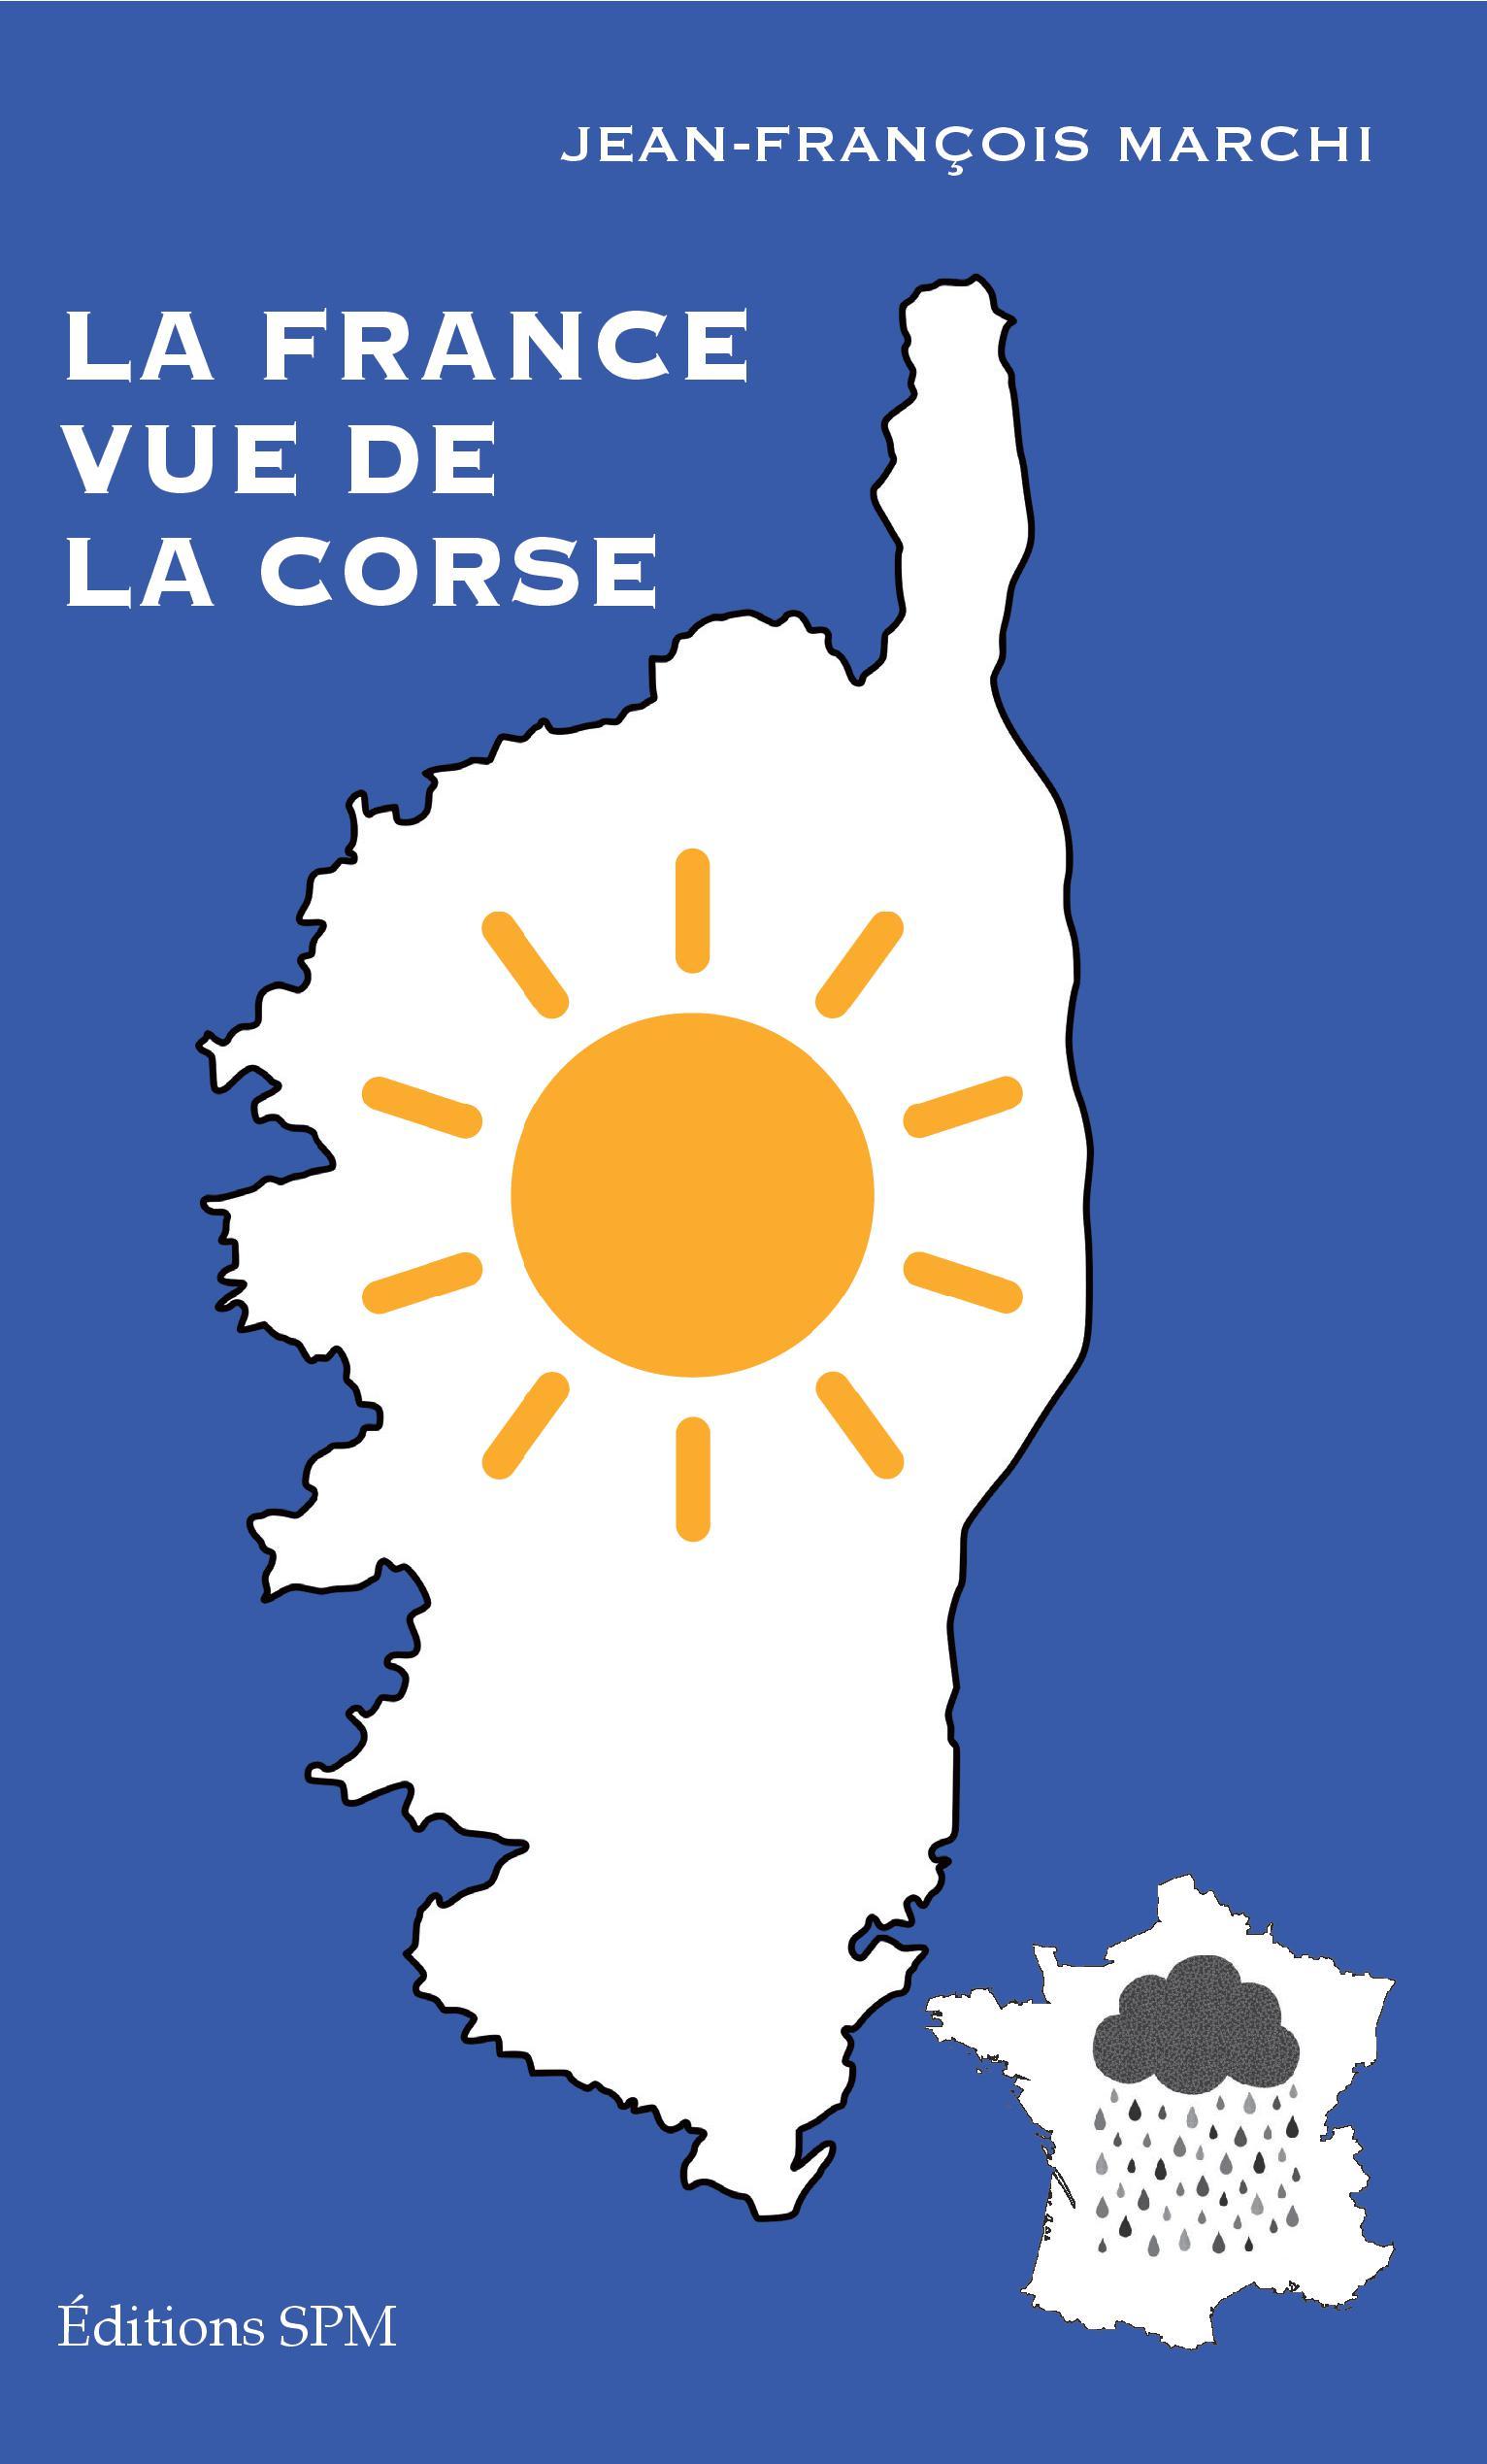 LA FRANCE VUE DE LA CORSE cover